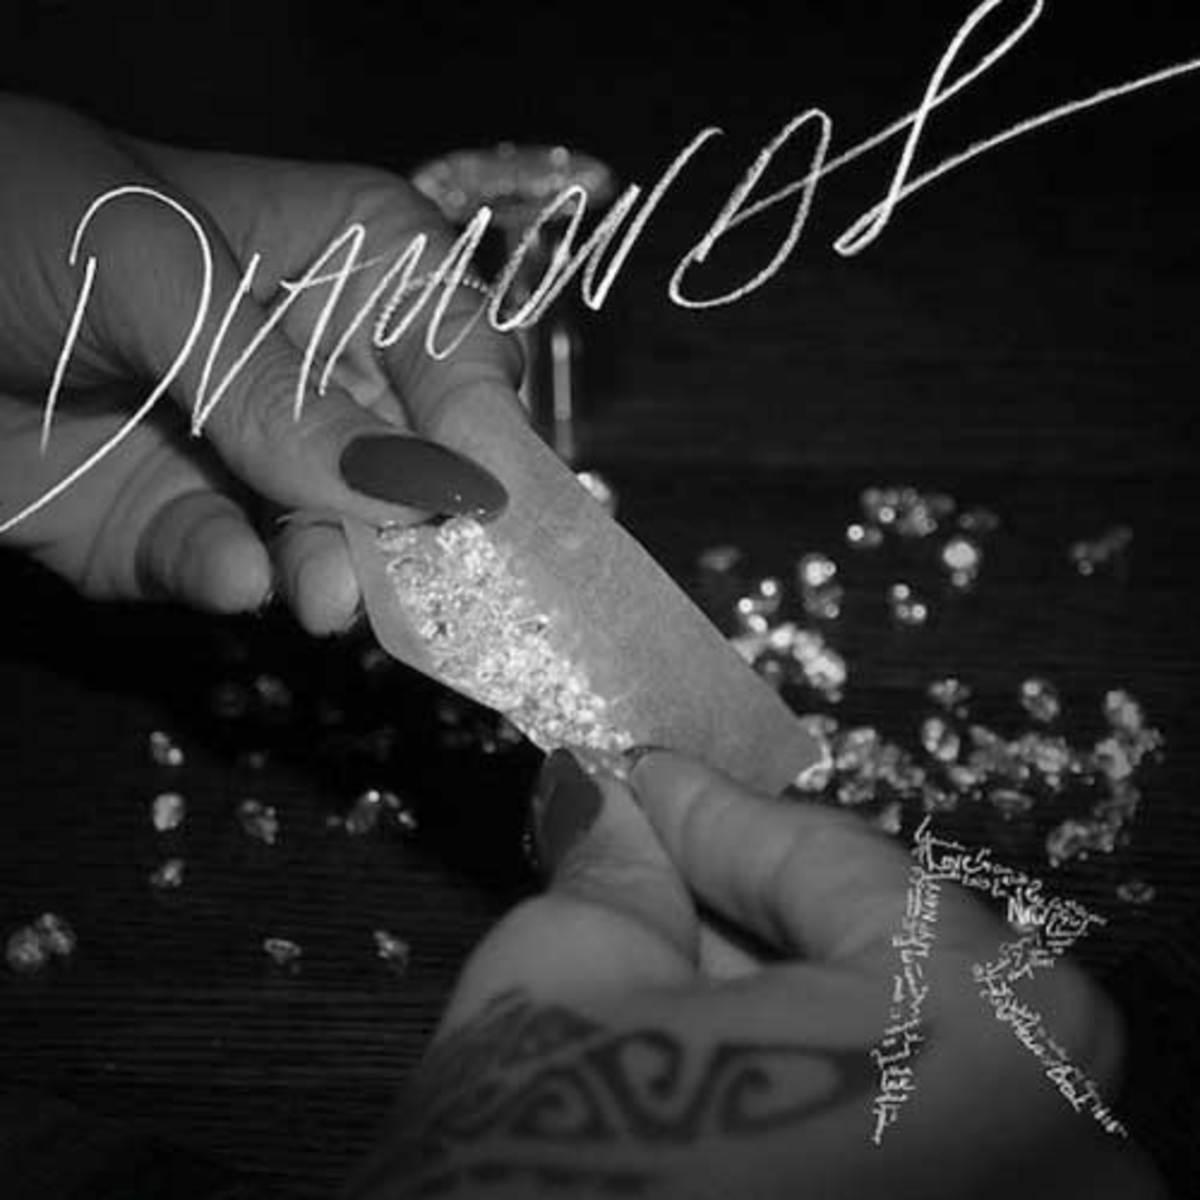 rihanna-diamonds.jpg